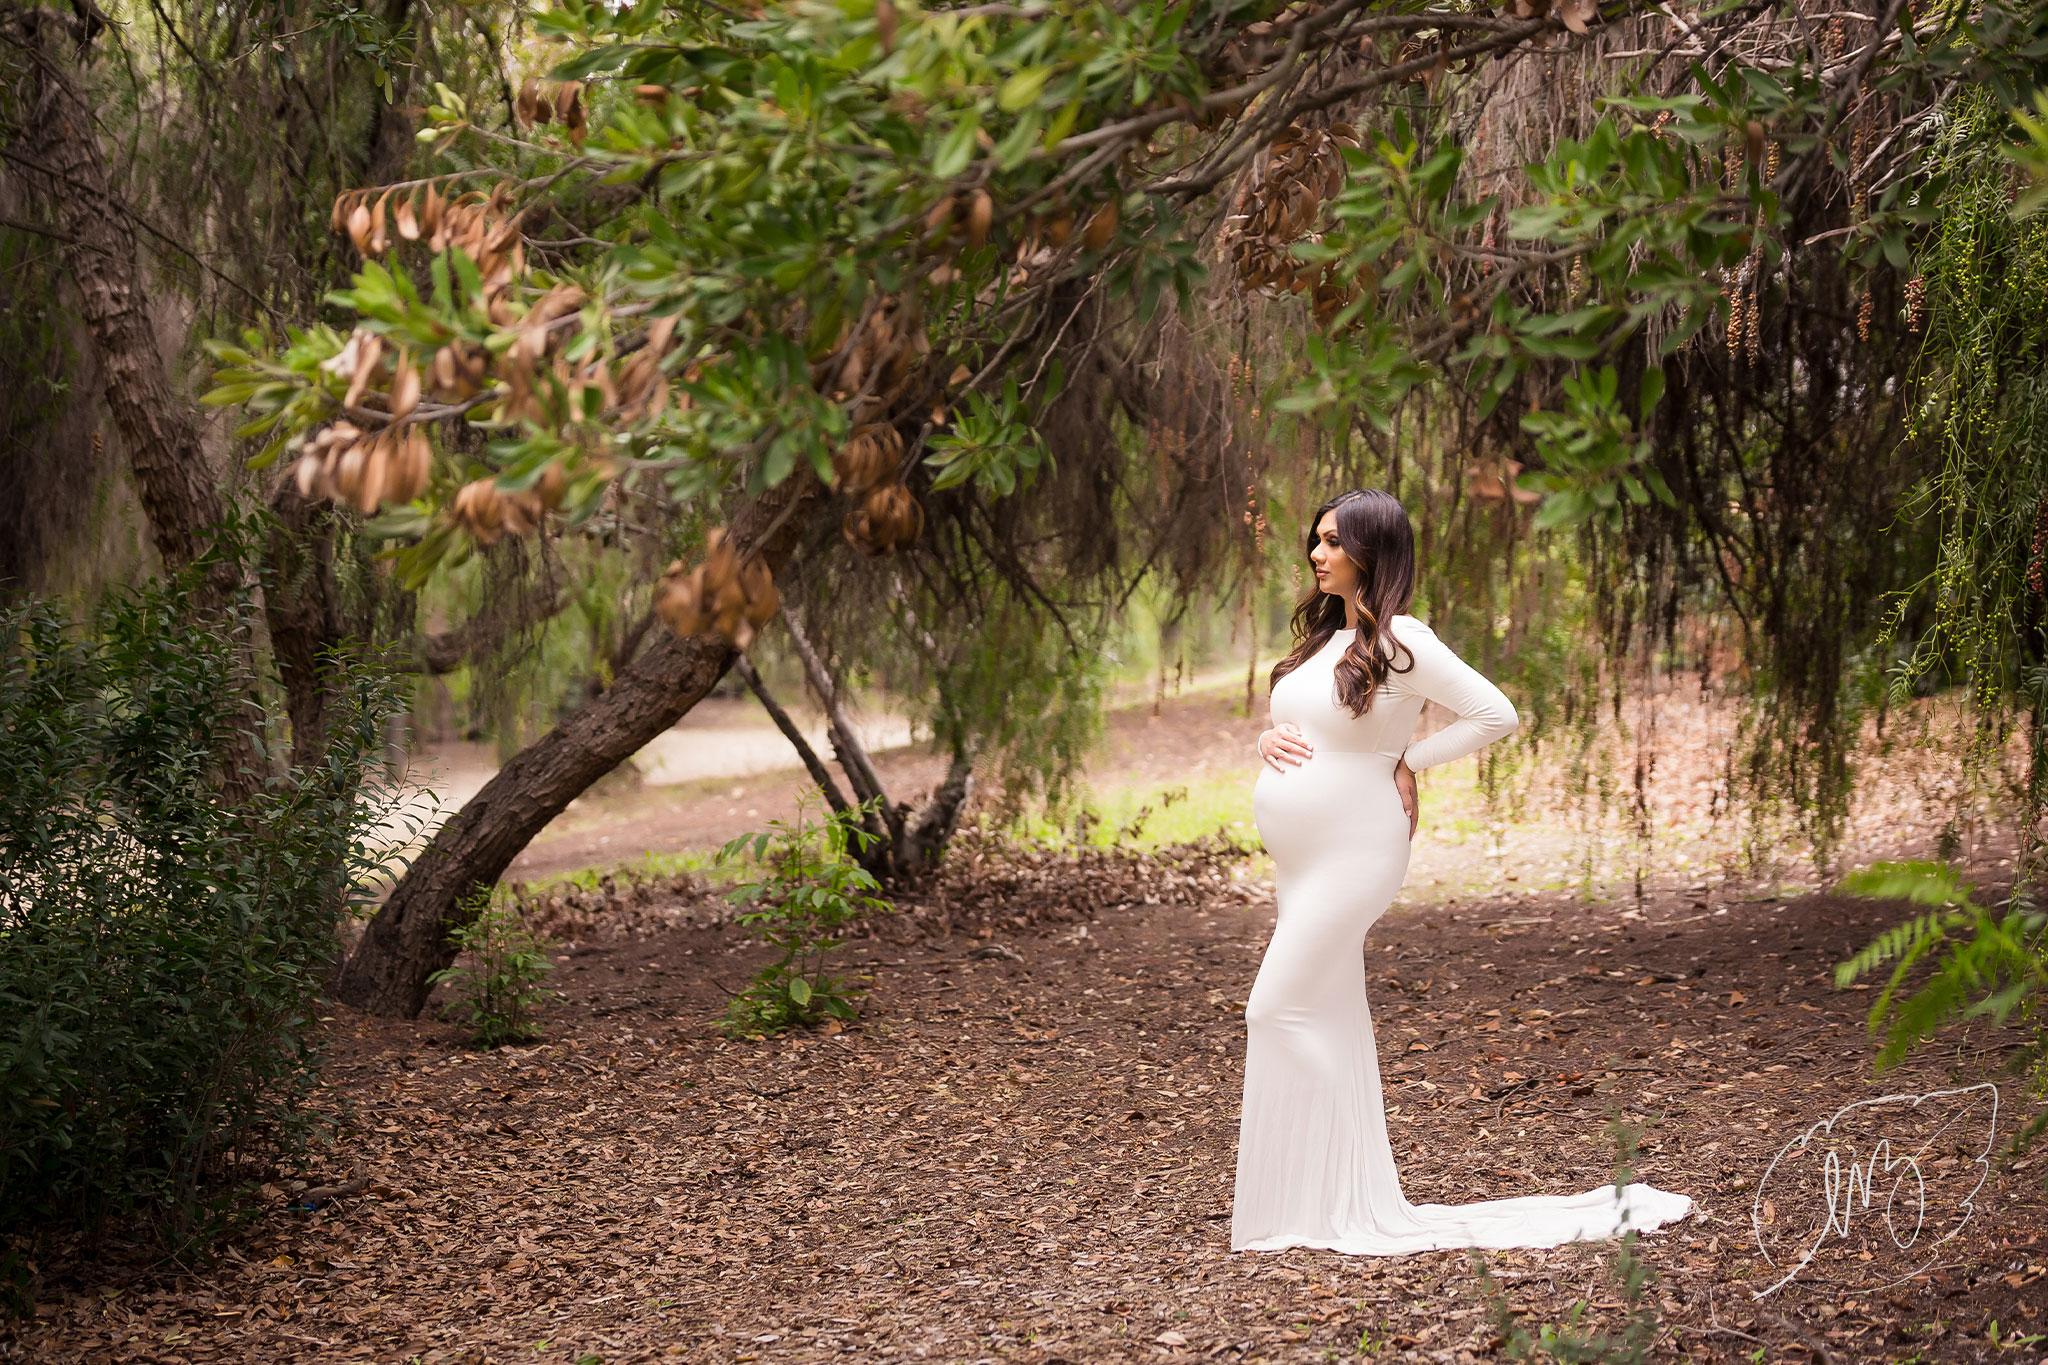 California_Inland_Empire_Maternity_Photographer_02.jpg